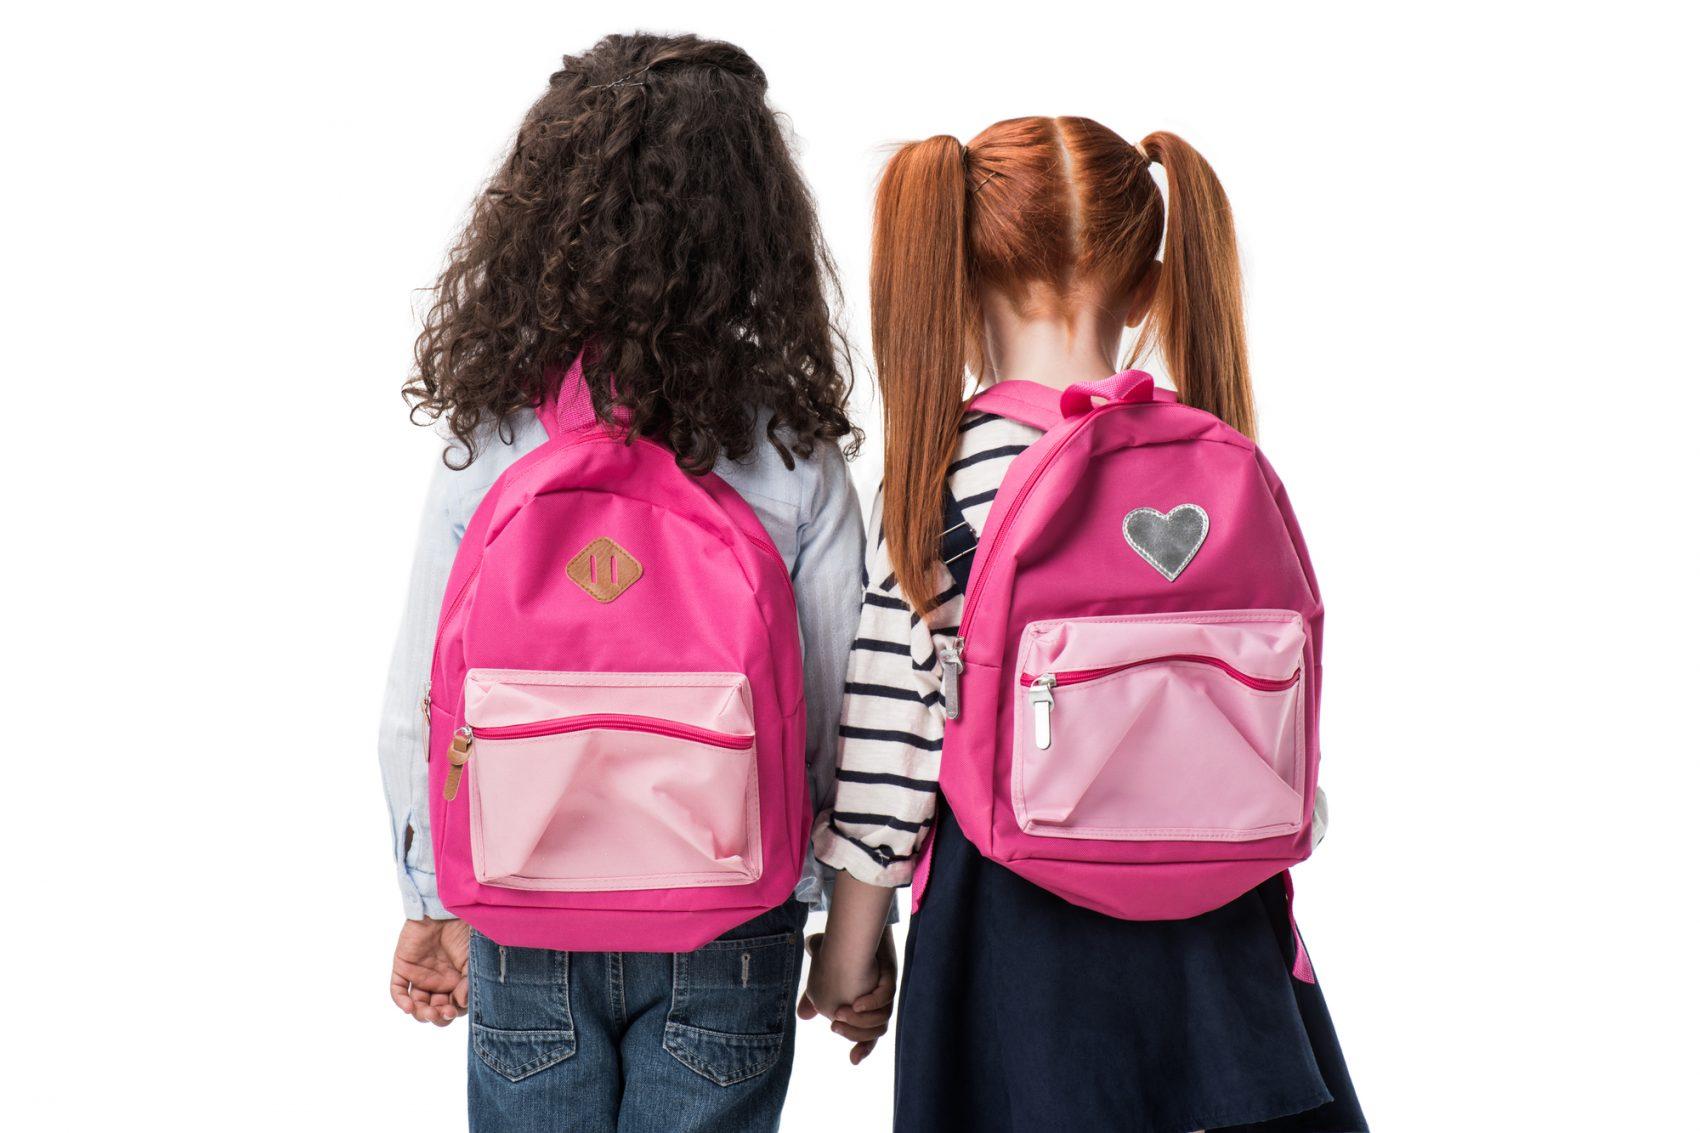 zaini scuola primaria bambina bambino